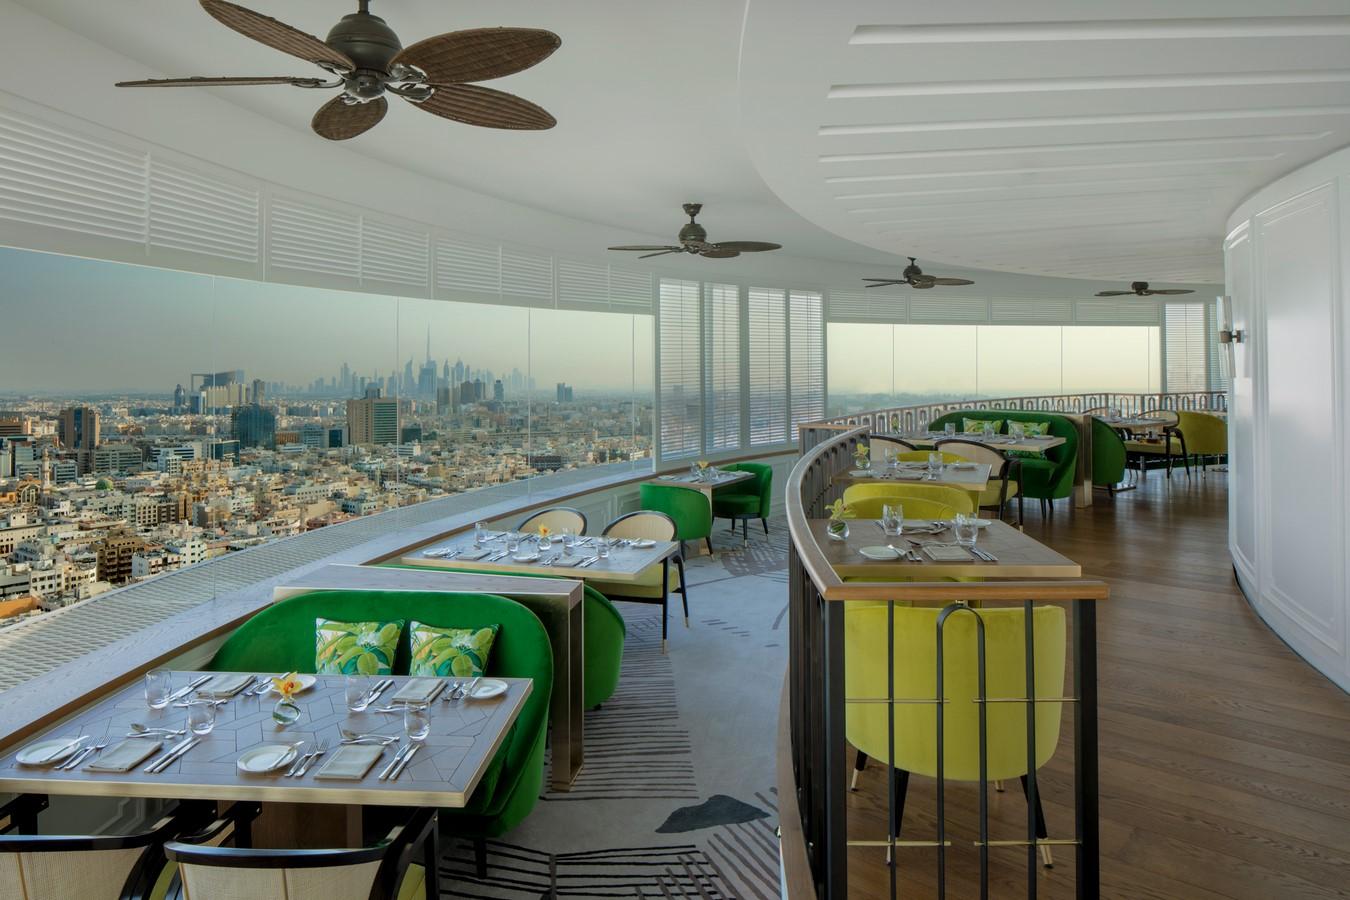 15 Examples of revolving hotels - Sheet14